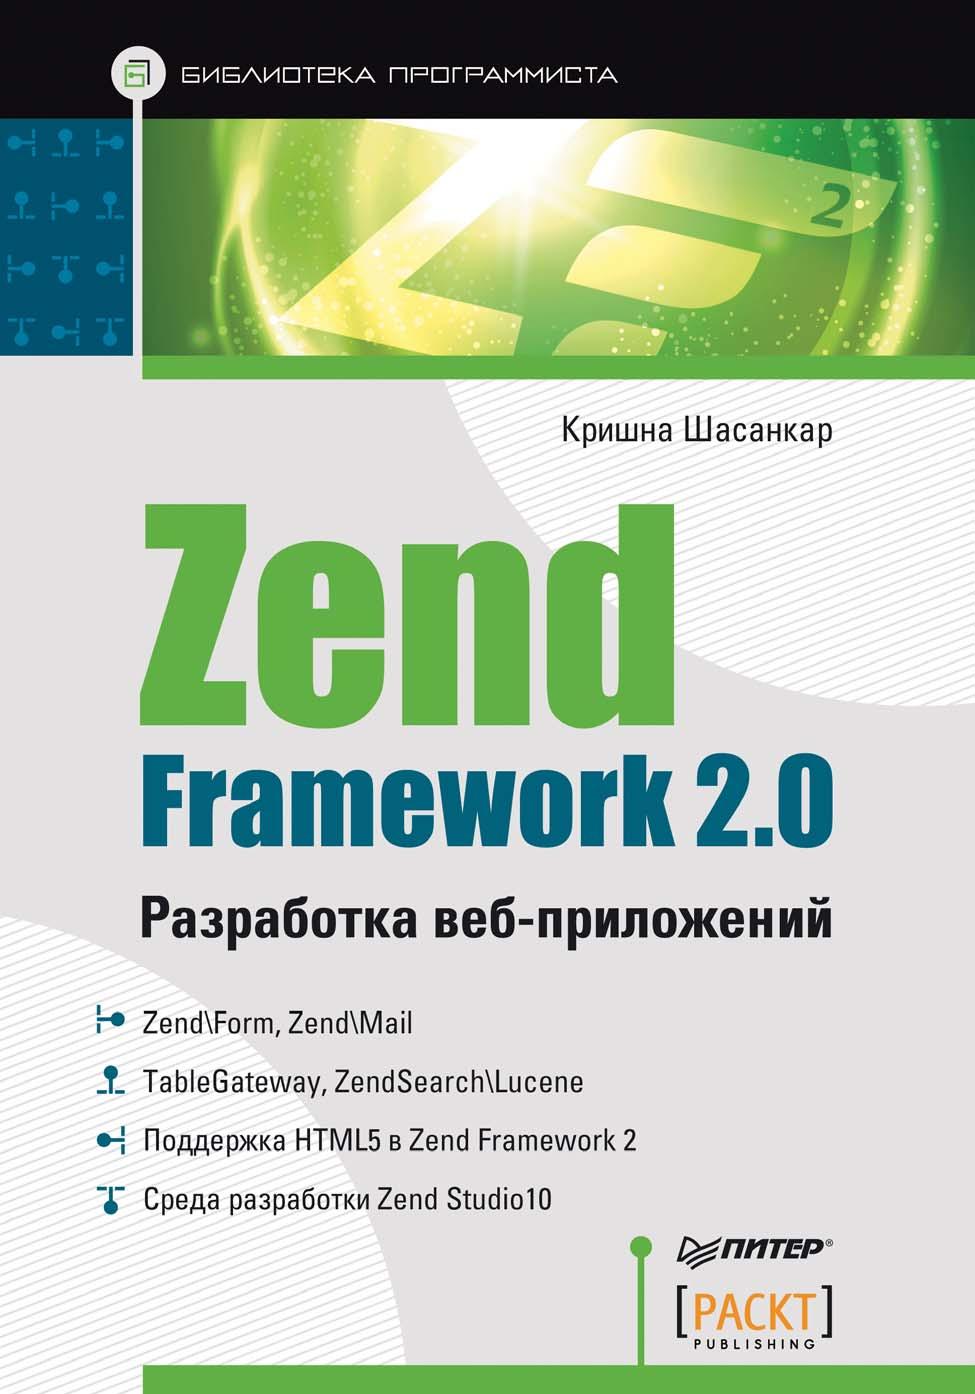 Кришна Шасанкар Zend Framework 2.0. Разработка веб-приложений модуль board новая версия разработка wifi на основе веб сервер esp8266